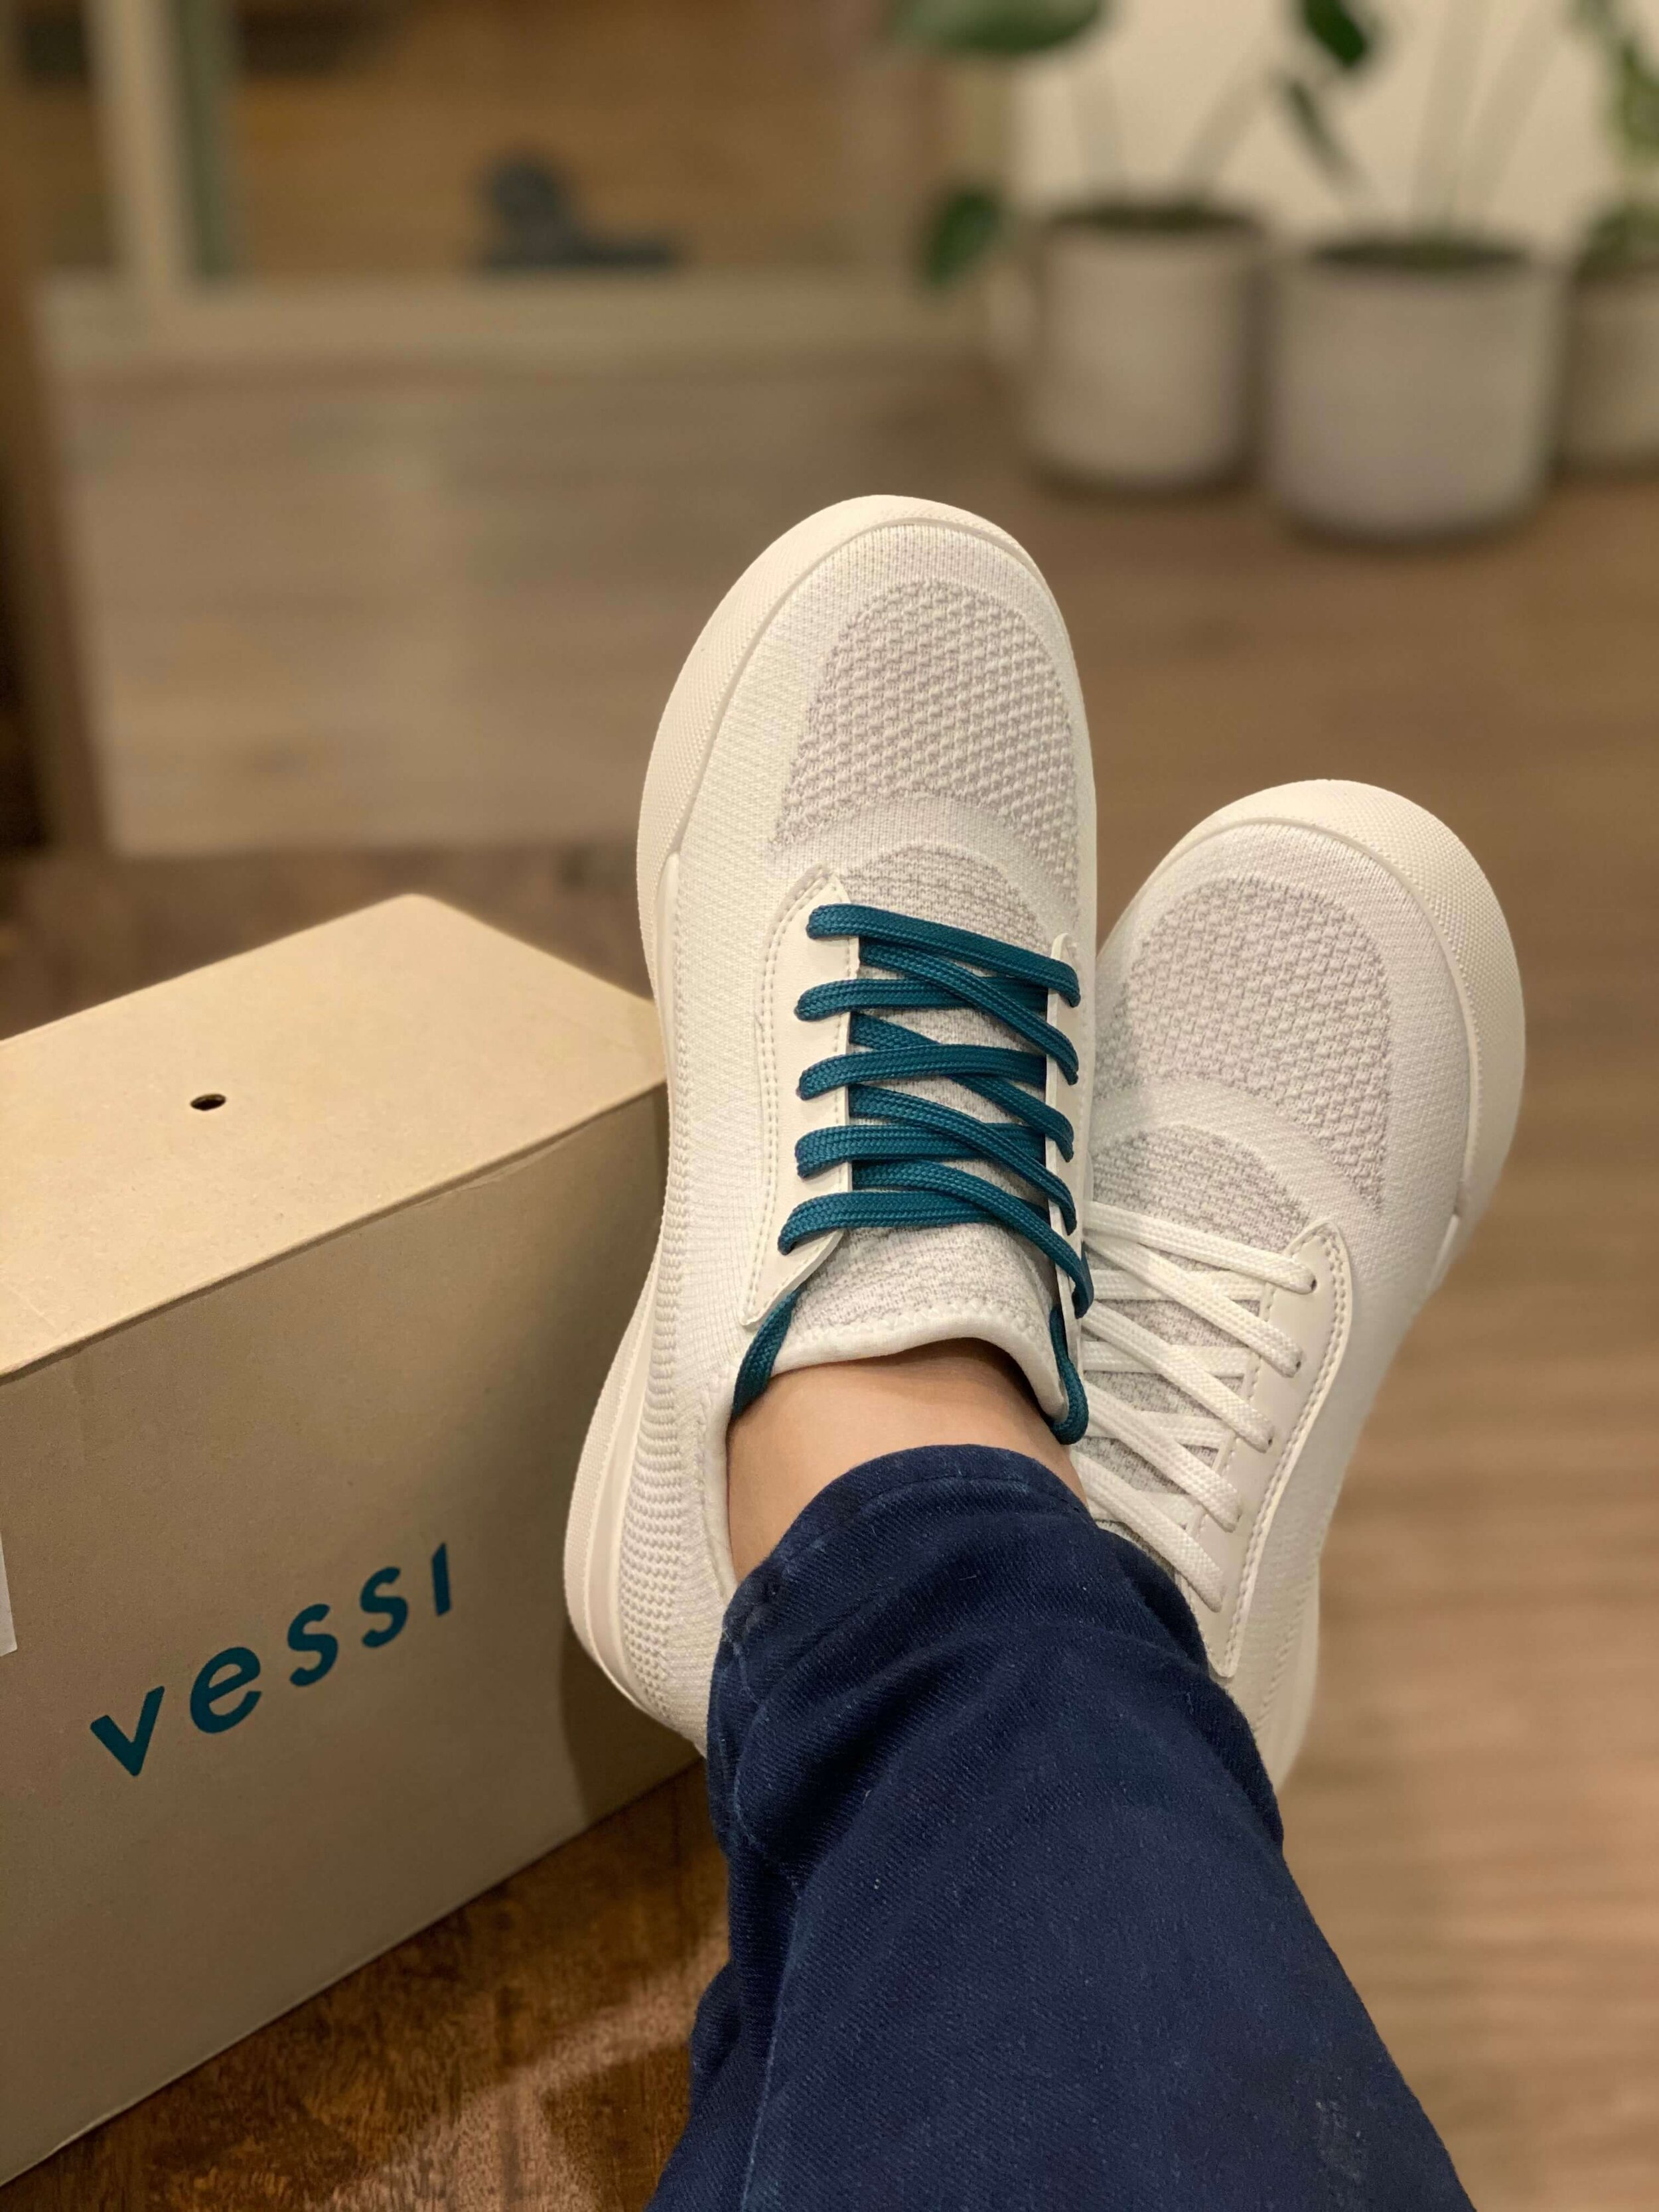 vessi reviews